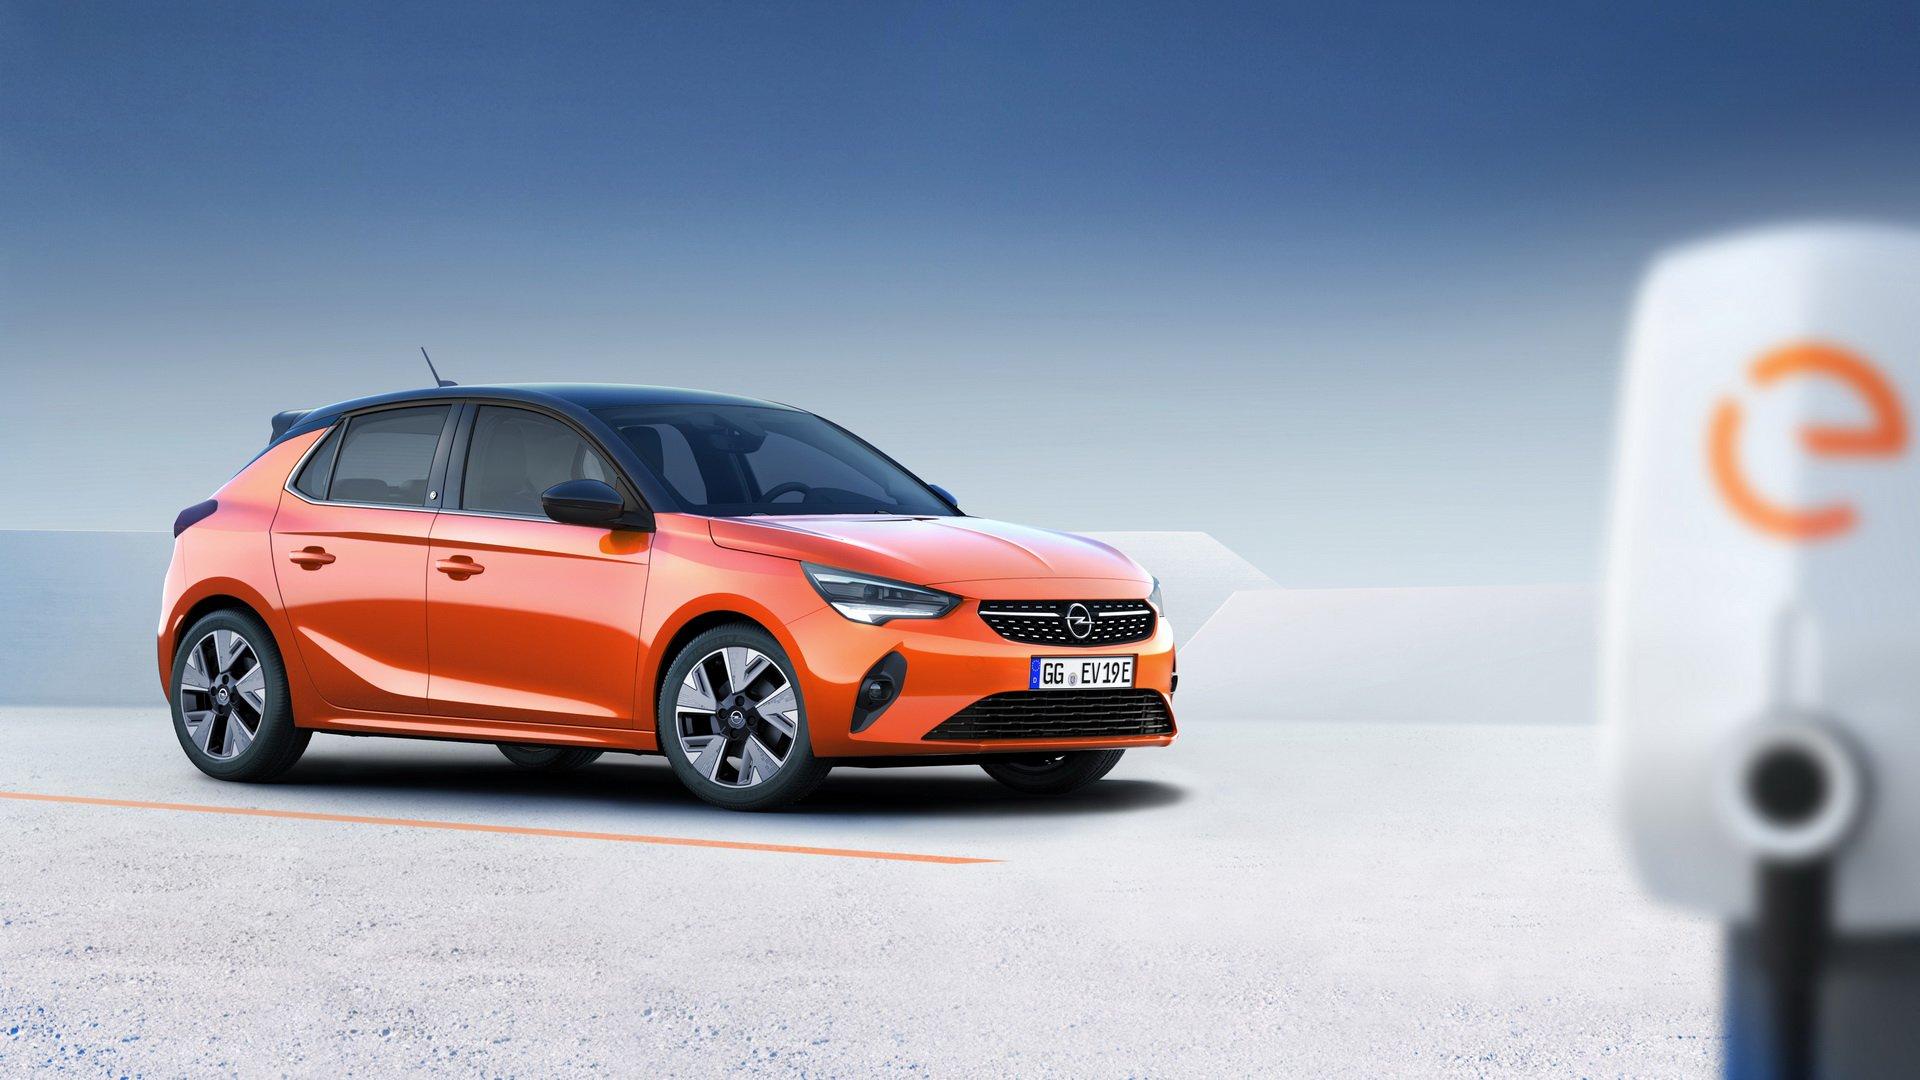 Новый Opel Corsa 2020 стал электромобилем